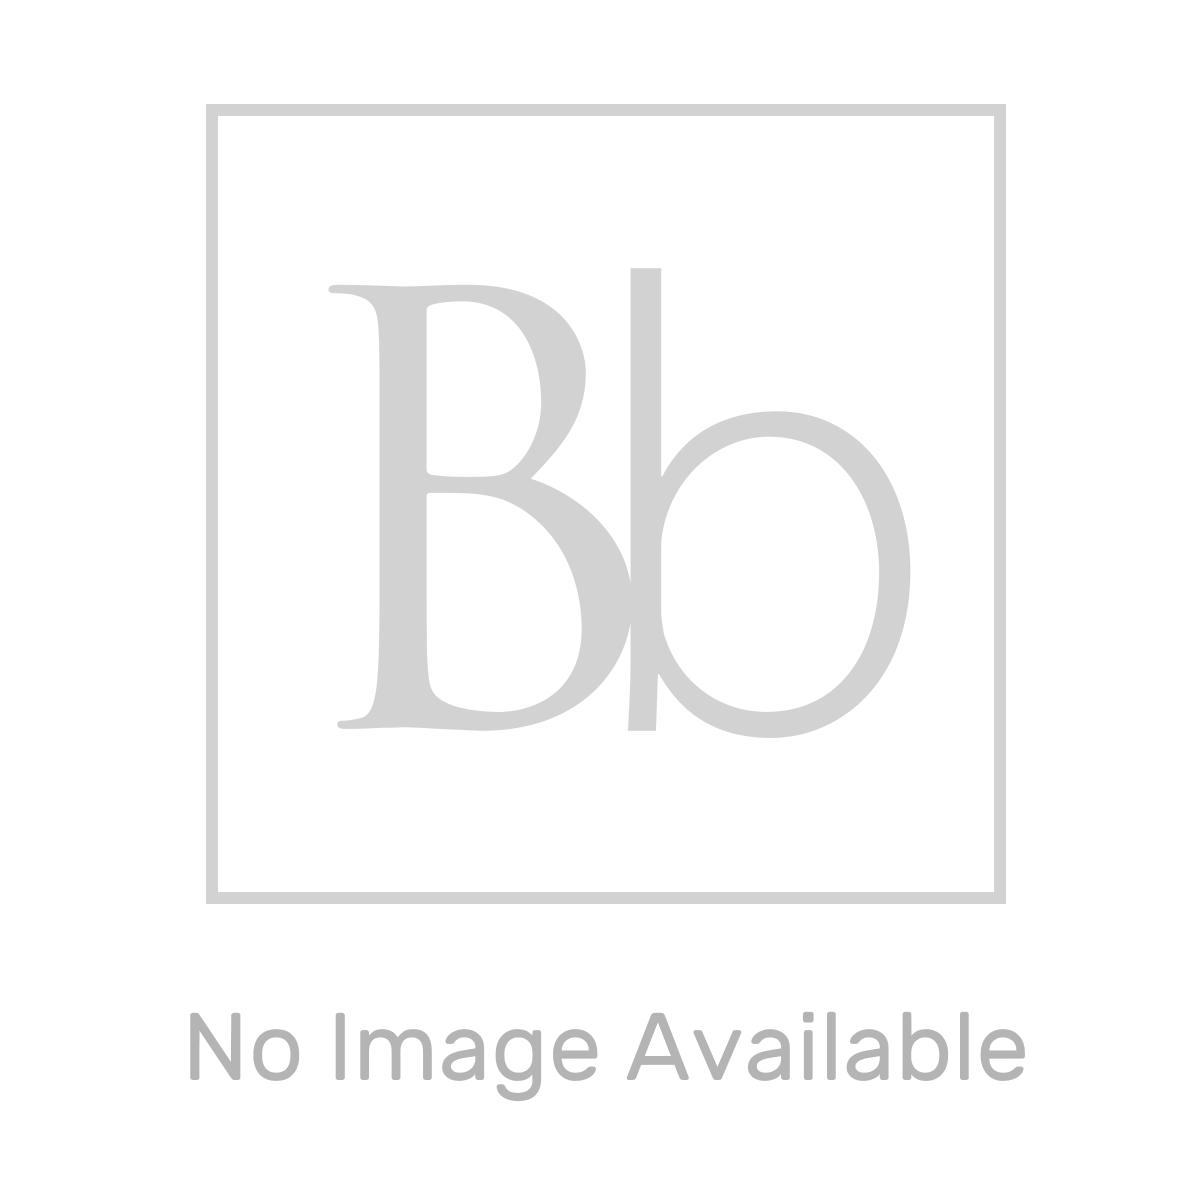 RAK Morning 1 Tap Hole Basin with Semi Pedestal 650mm Measurements